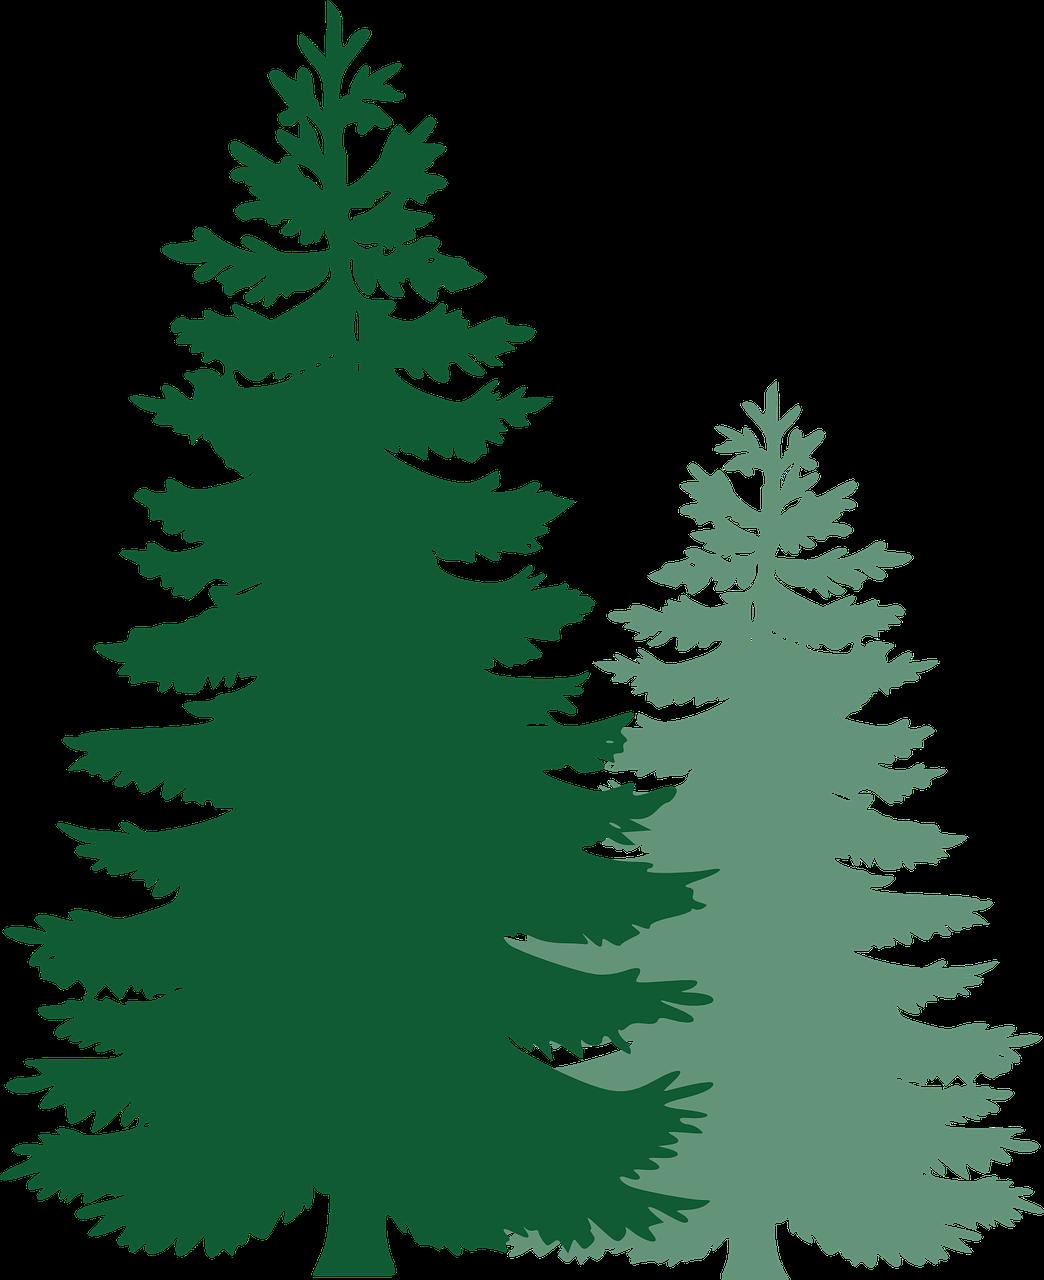 medium resolution of pine trees spruce trees evergreen trees tree spruce